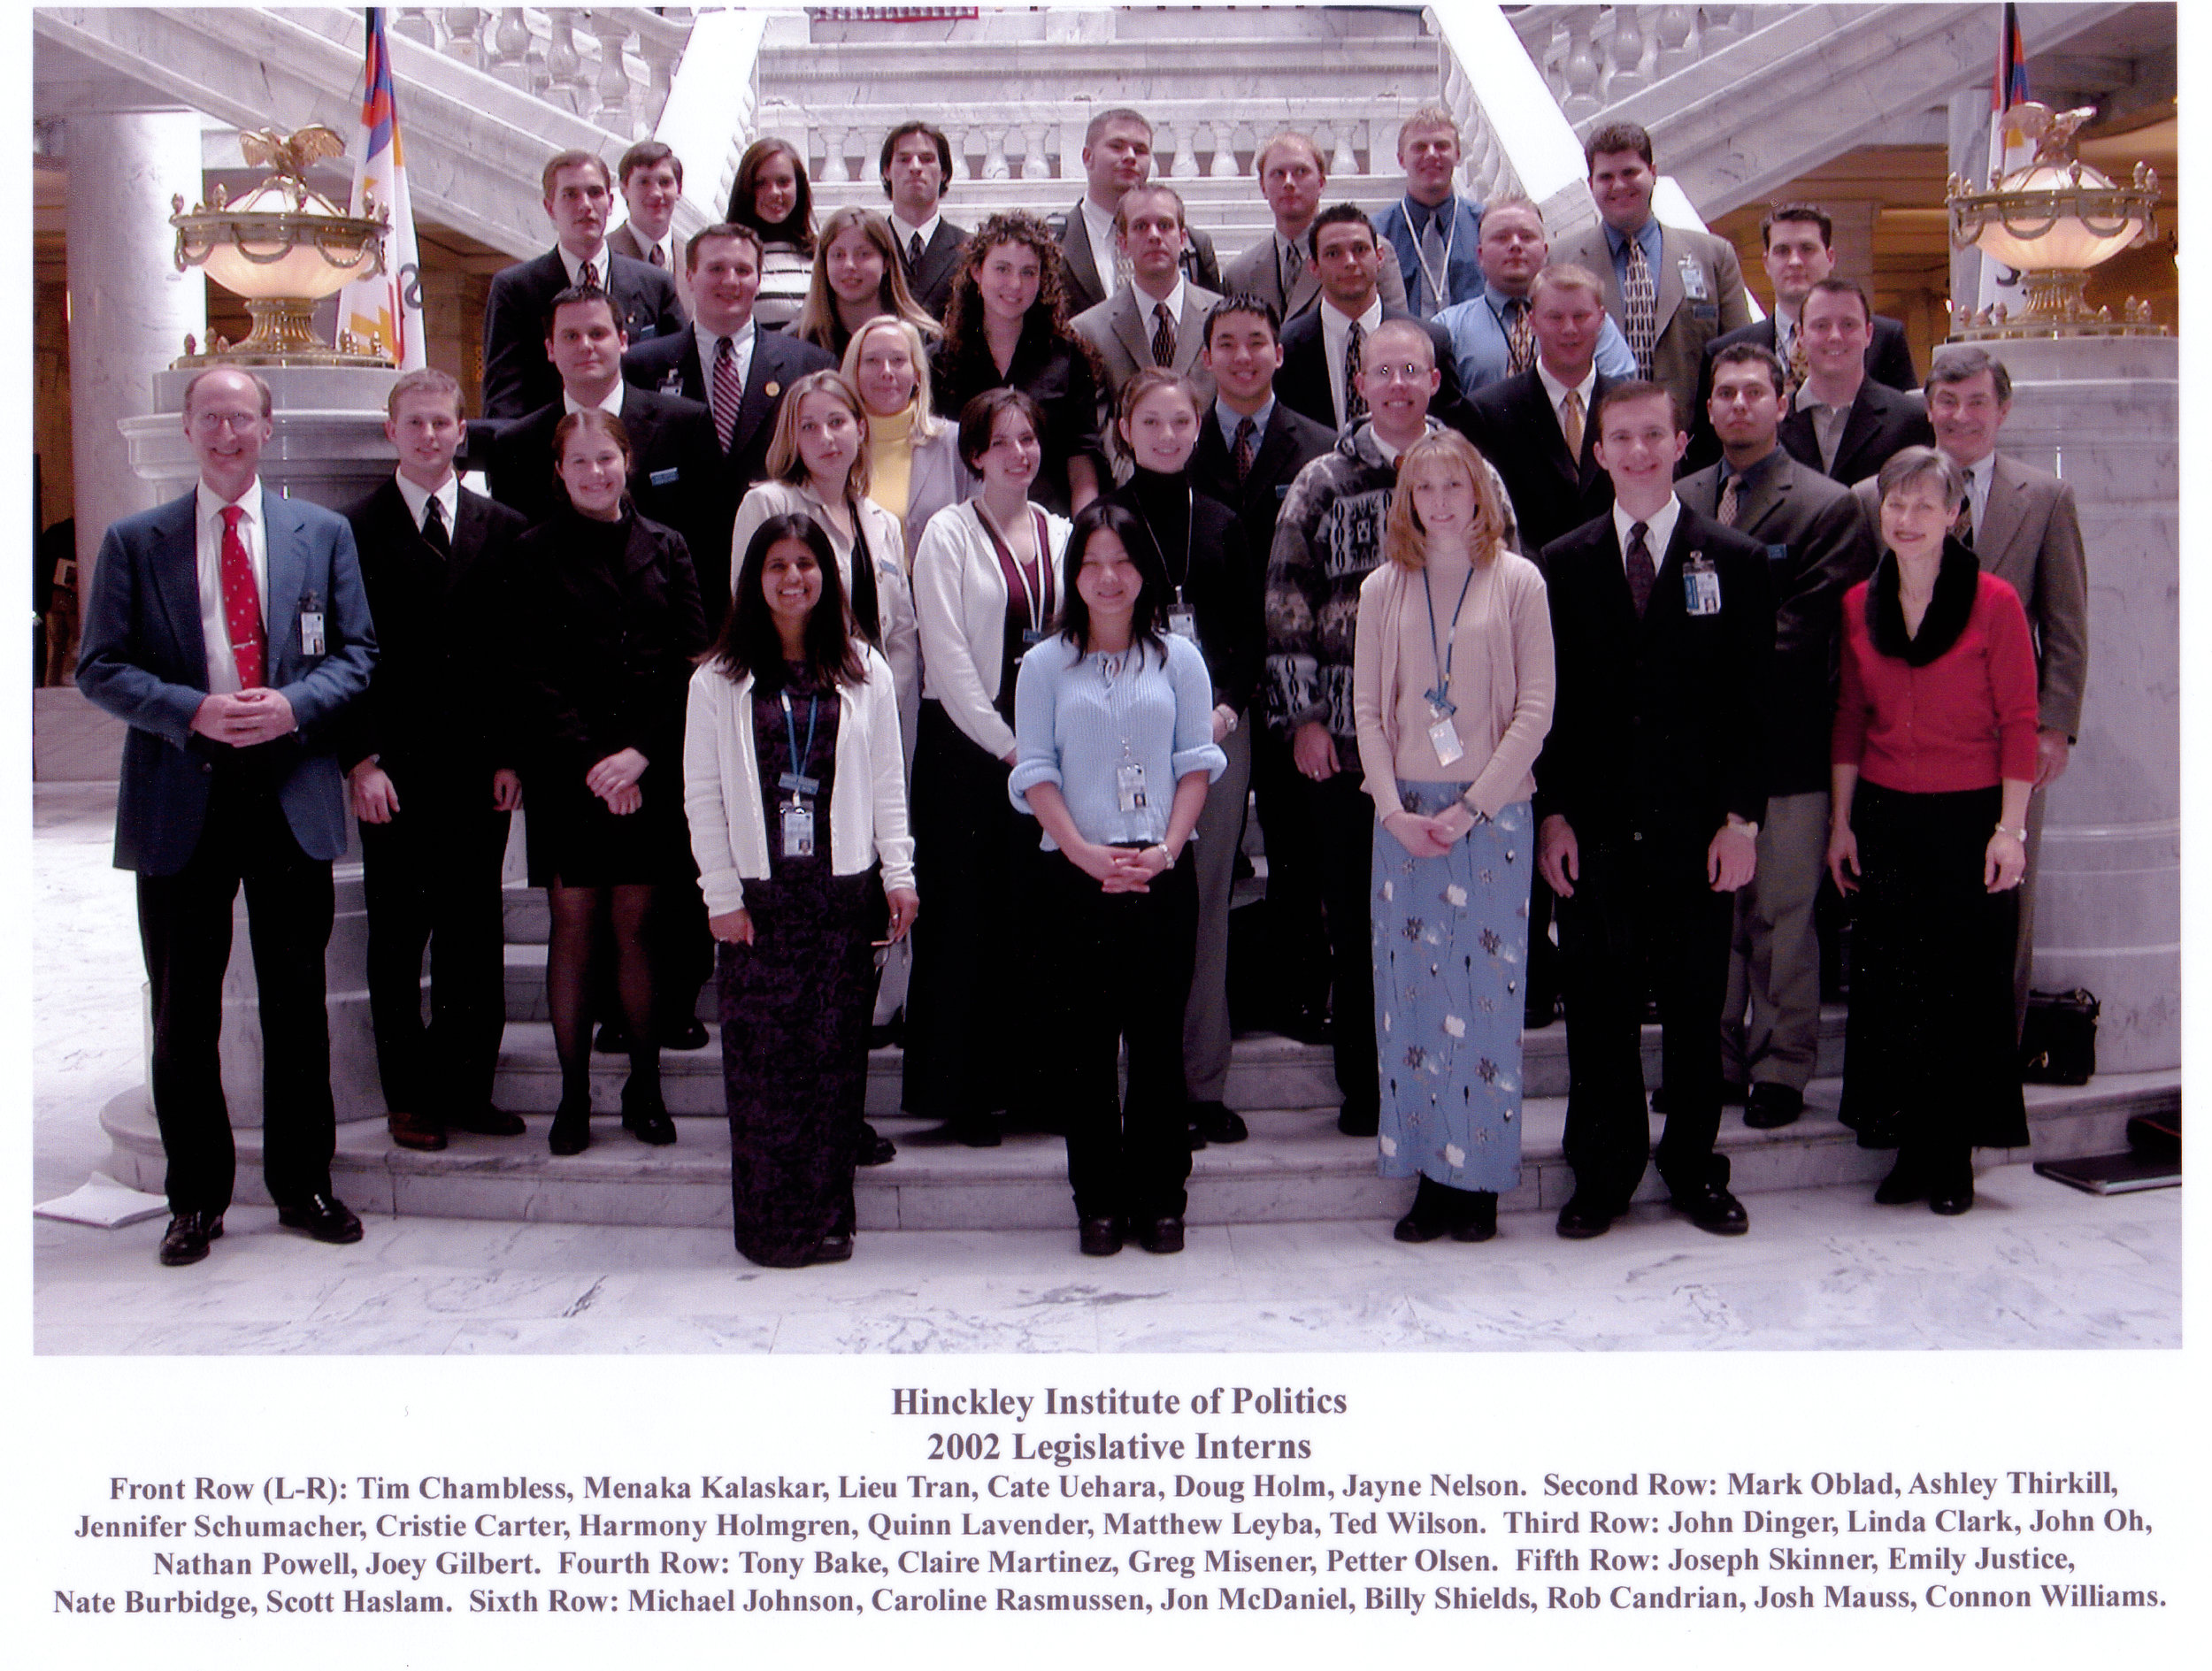 2002 Legislative Interns.jpg